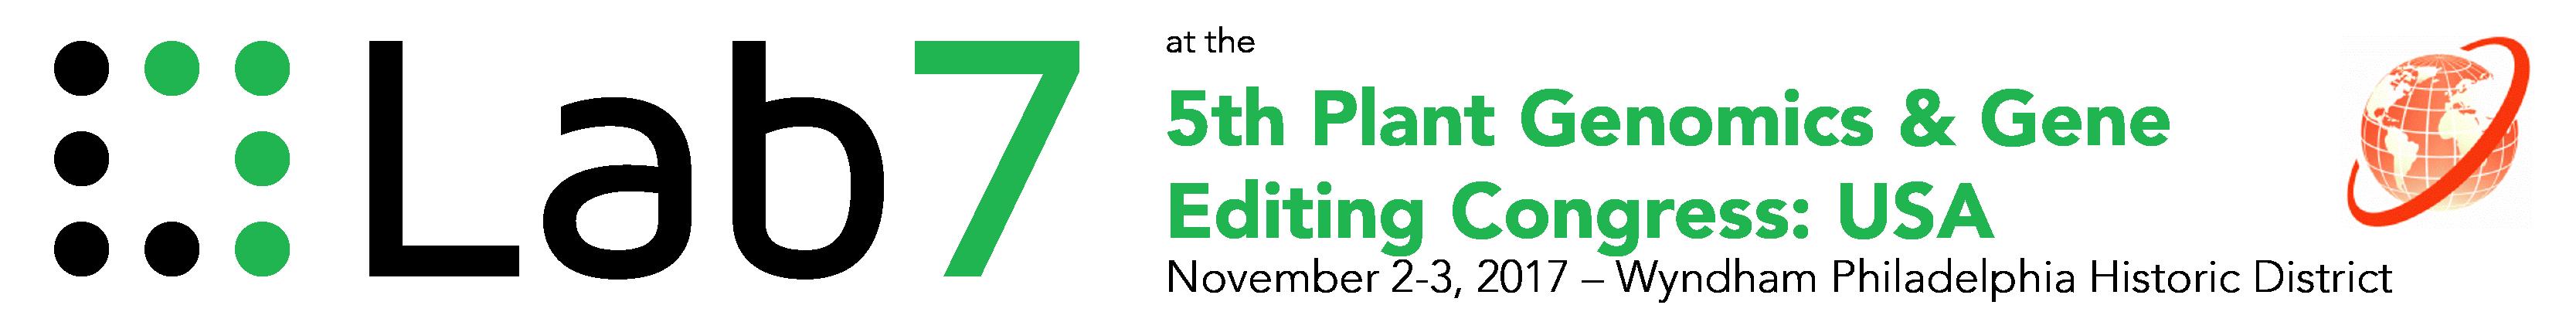 Lab7_Plant Genomics blast header.png